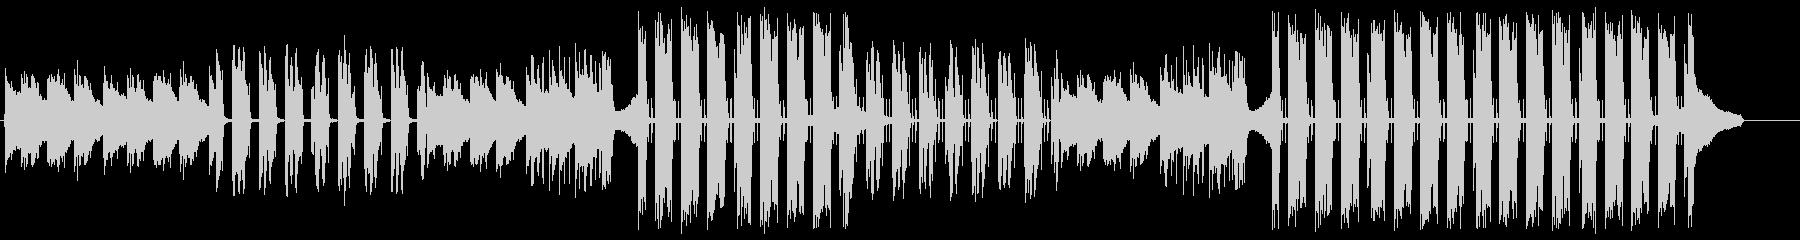 Future Pop 洋楽 メロウ の未再生の波形